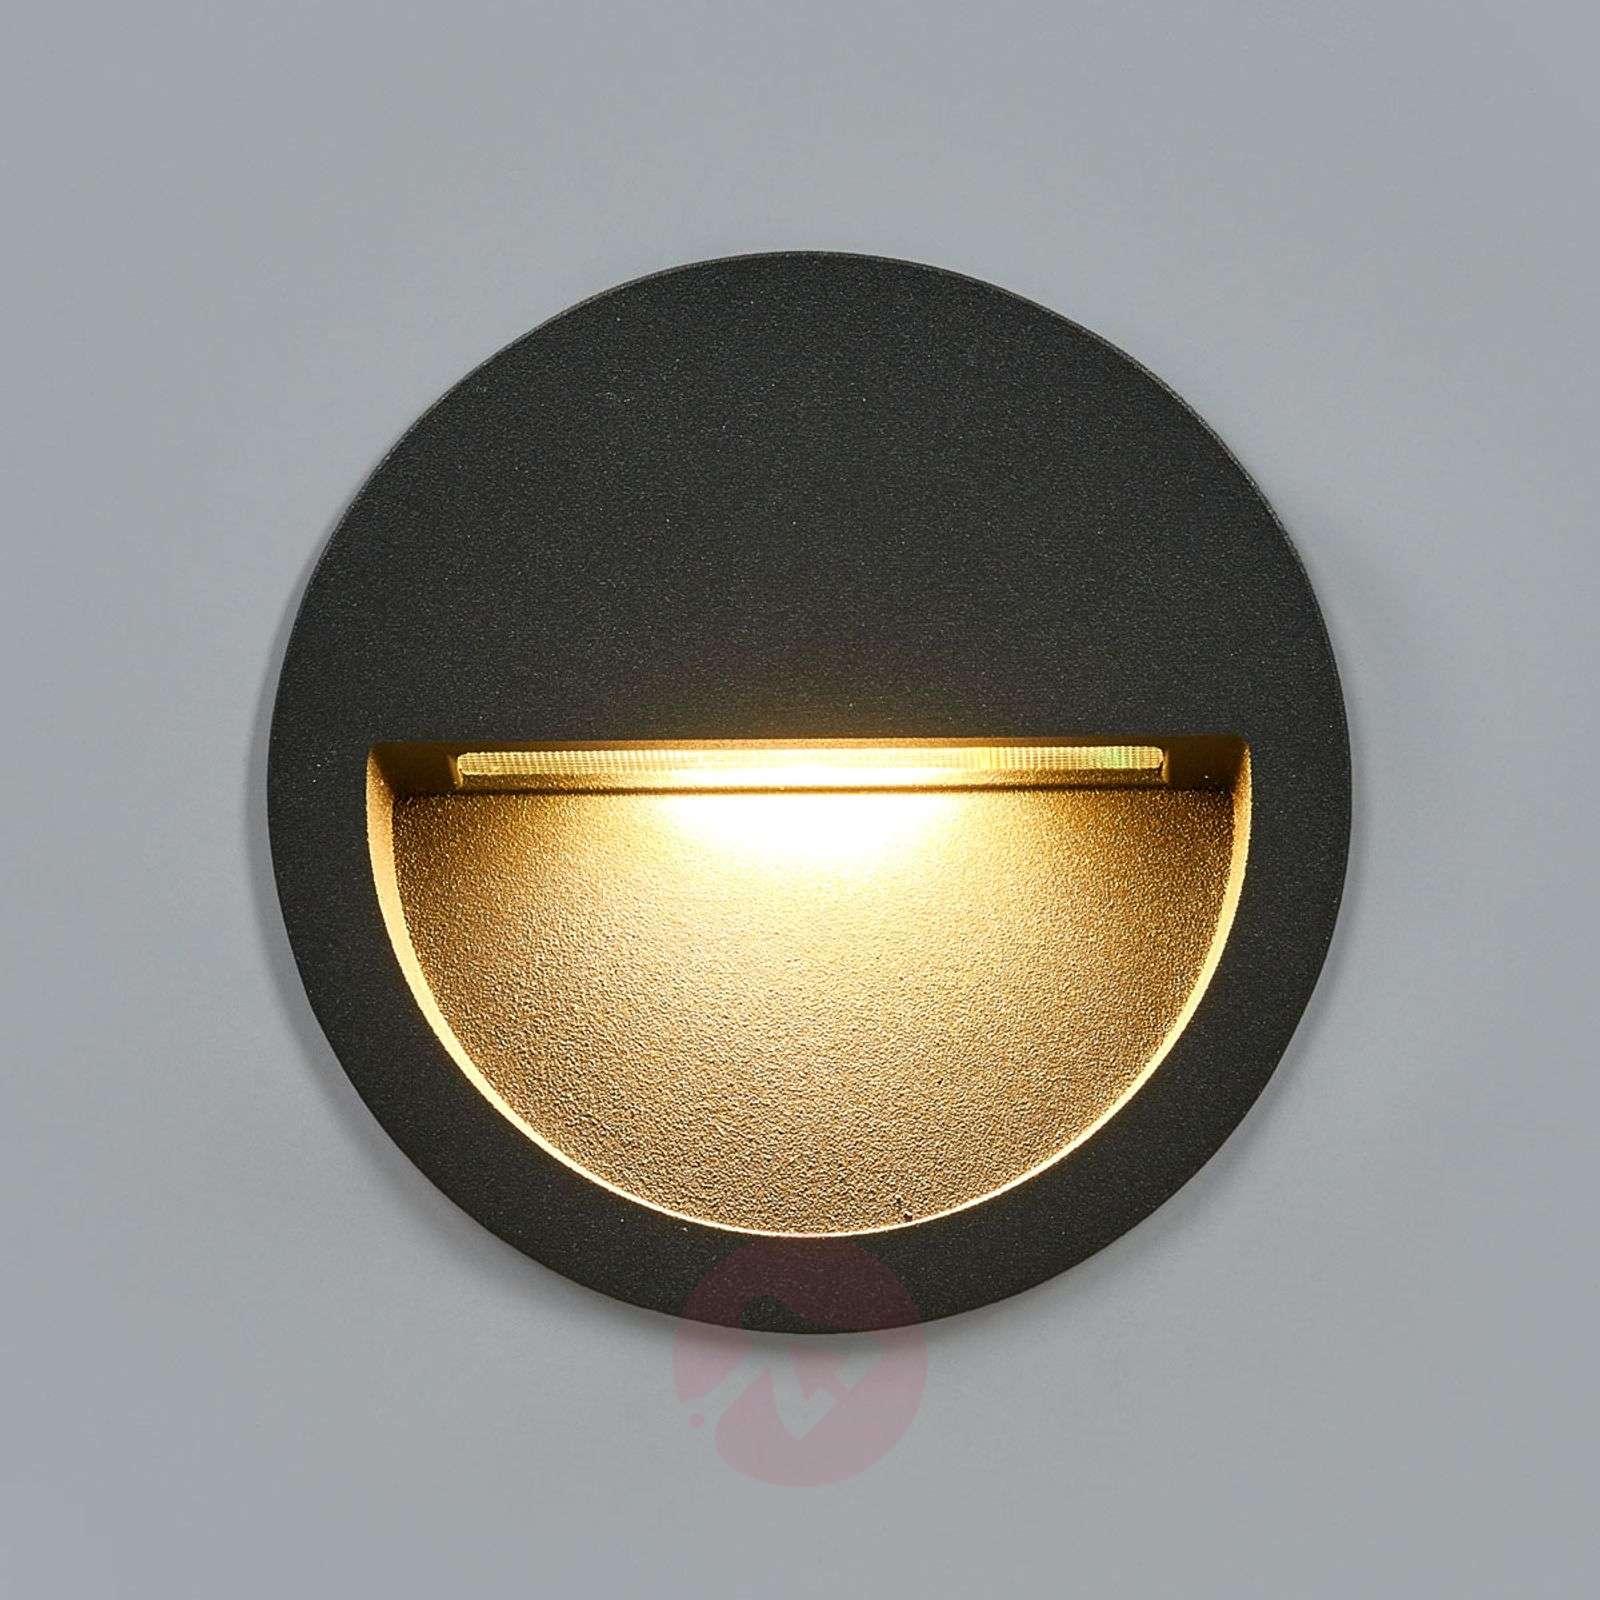 Round led recessed wall light loya lights round led recessed wall light loya 9969037 02 aloadofball Image collections